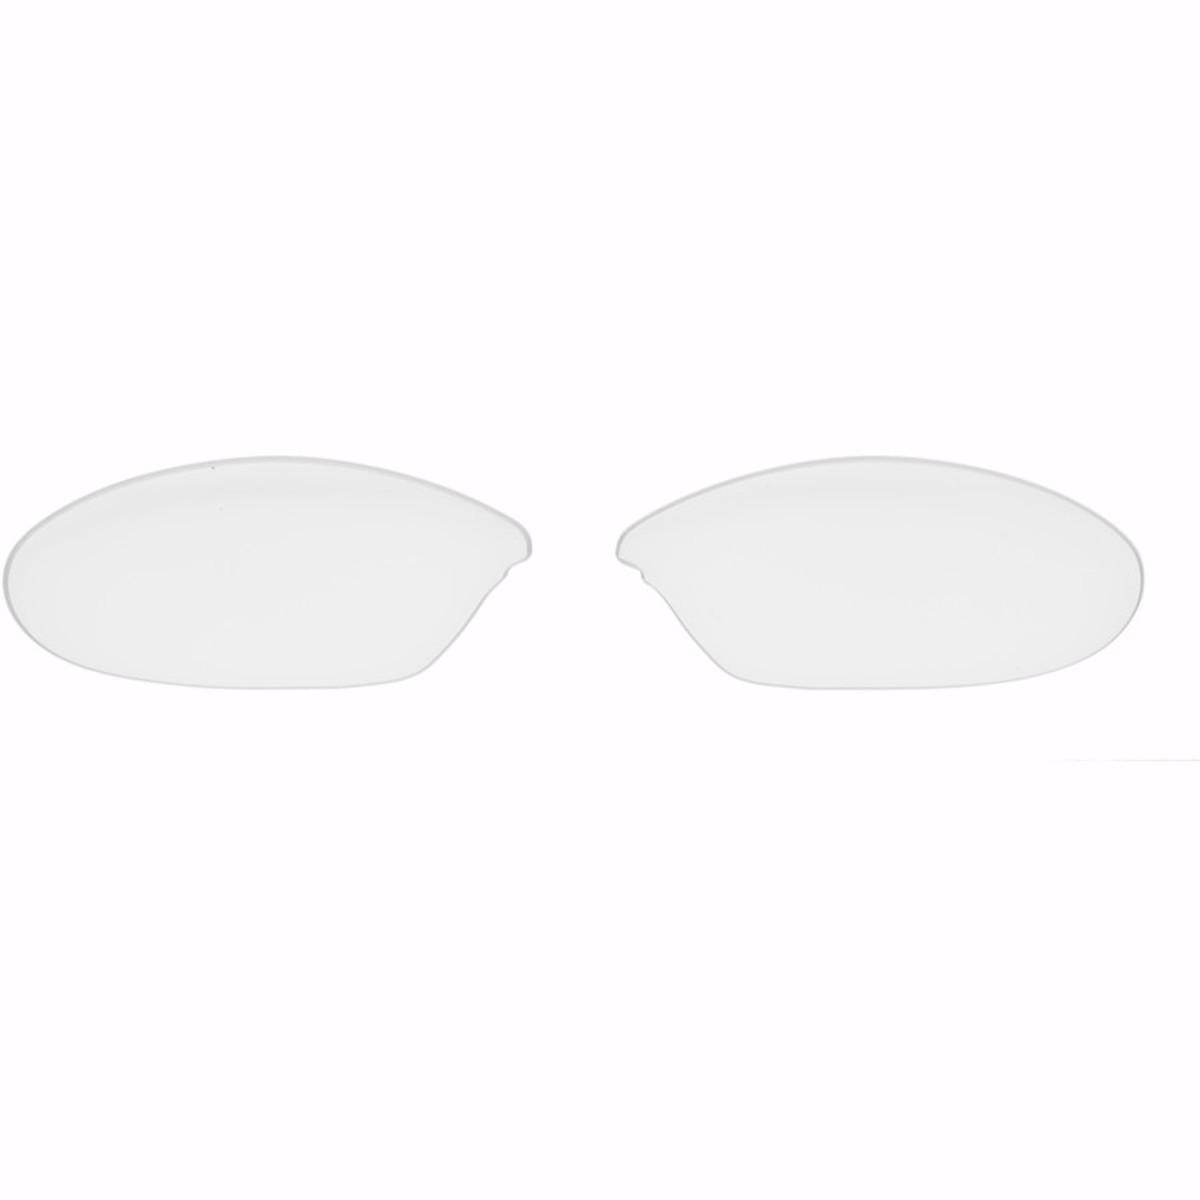 photo: Native Eyewear Silencer Lens Kit sunglass lens